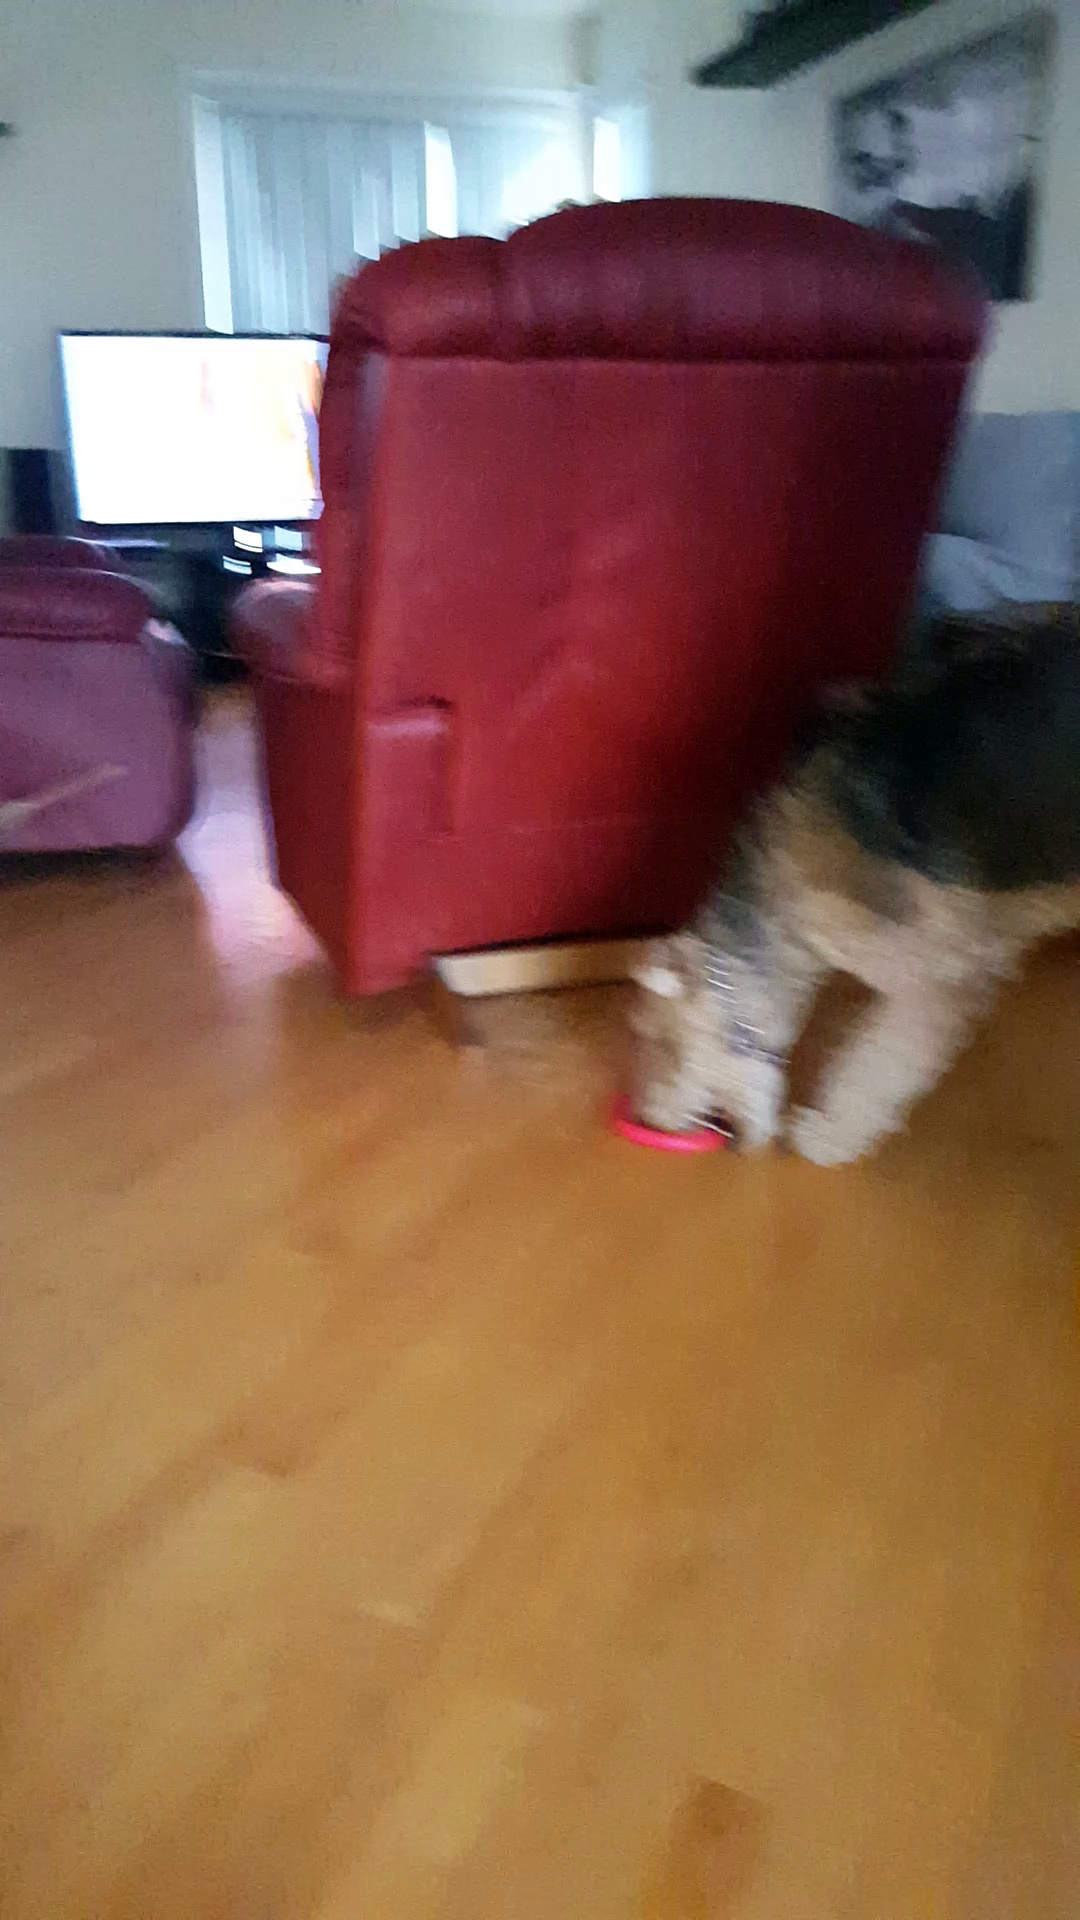 Dog enjoying broken toy